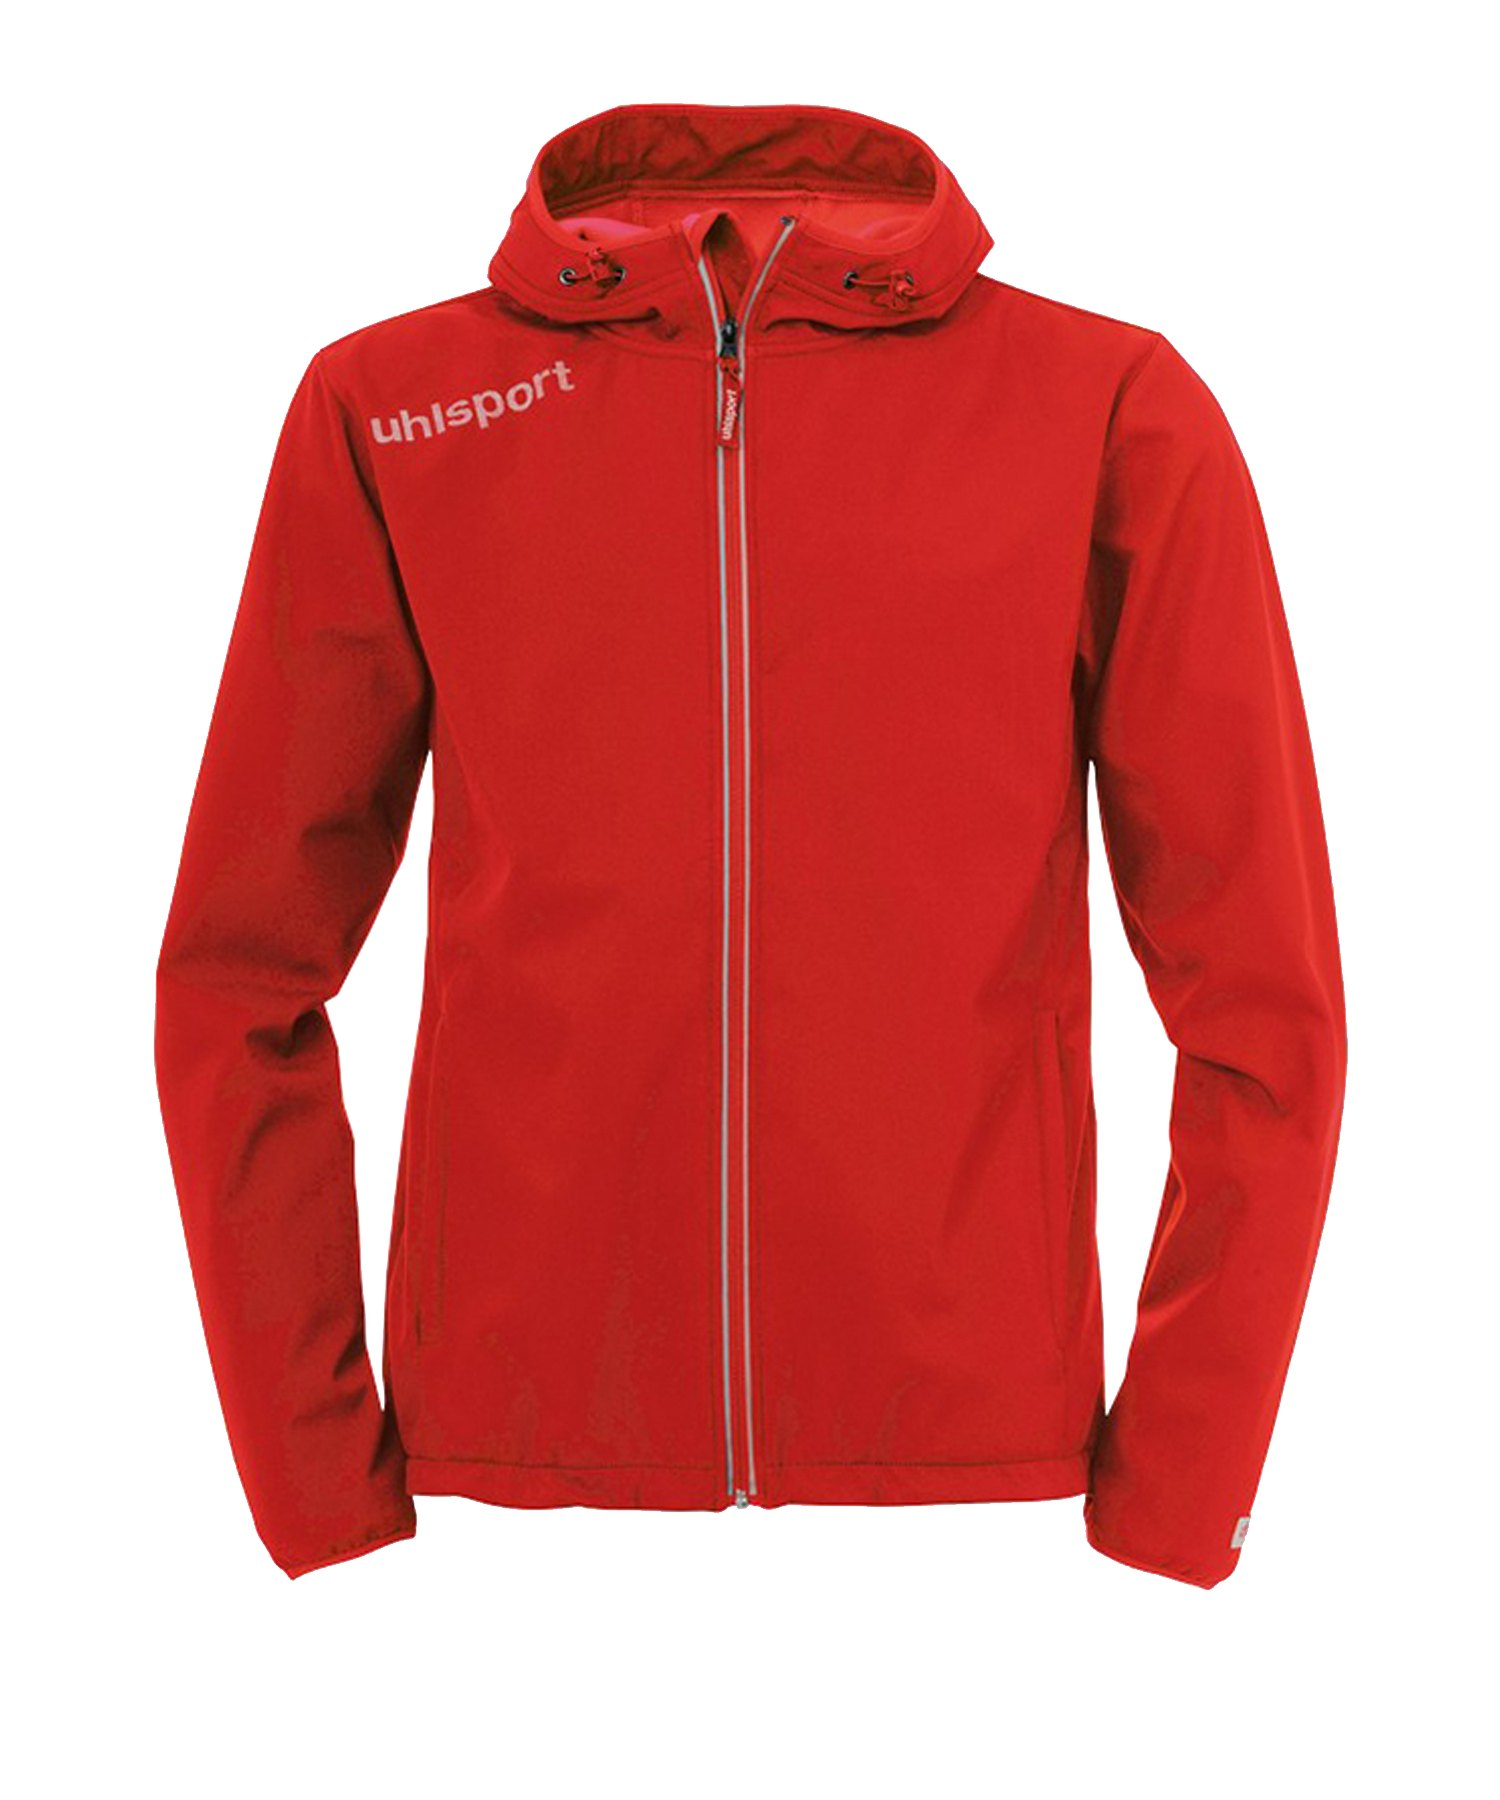 Uhlsport Essential Softshell Jacket Jacke Rot F06 - rot